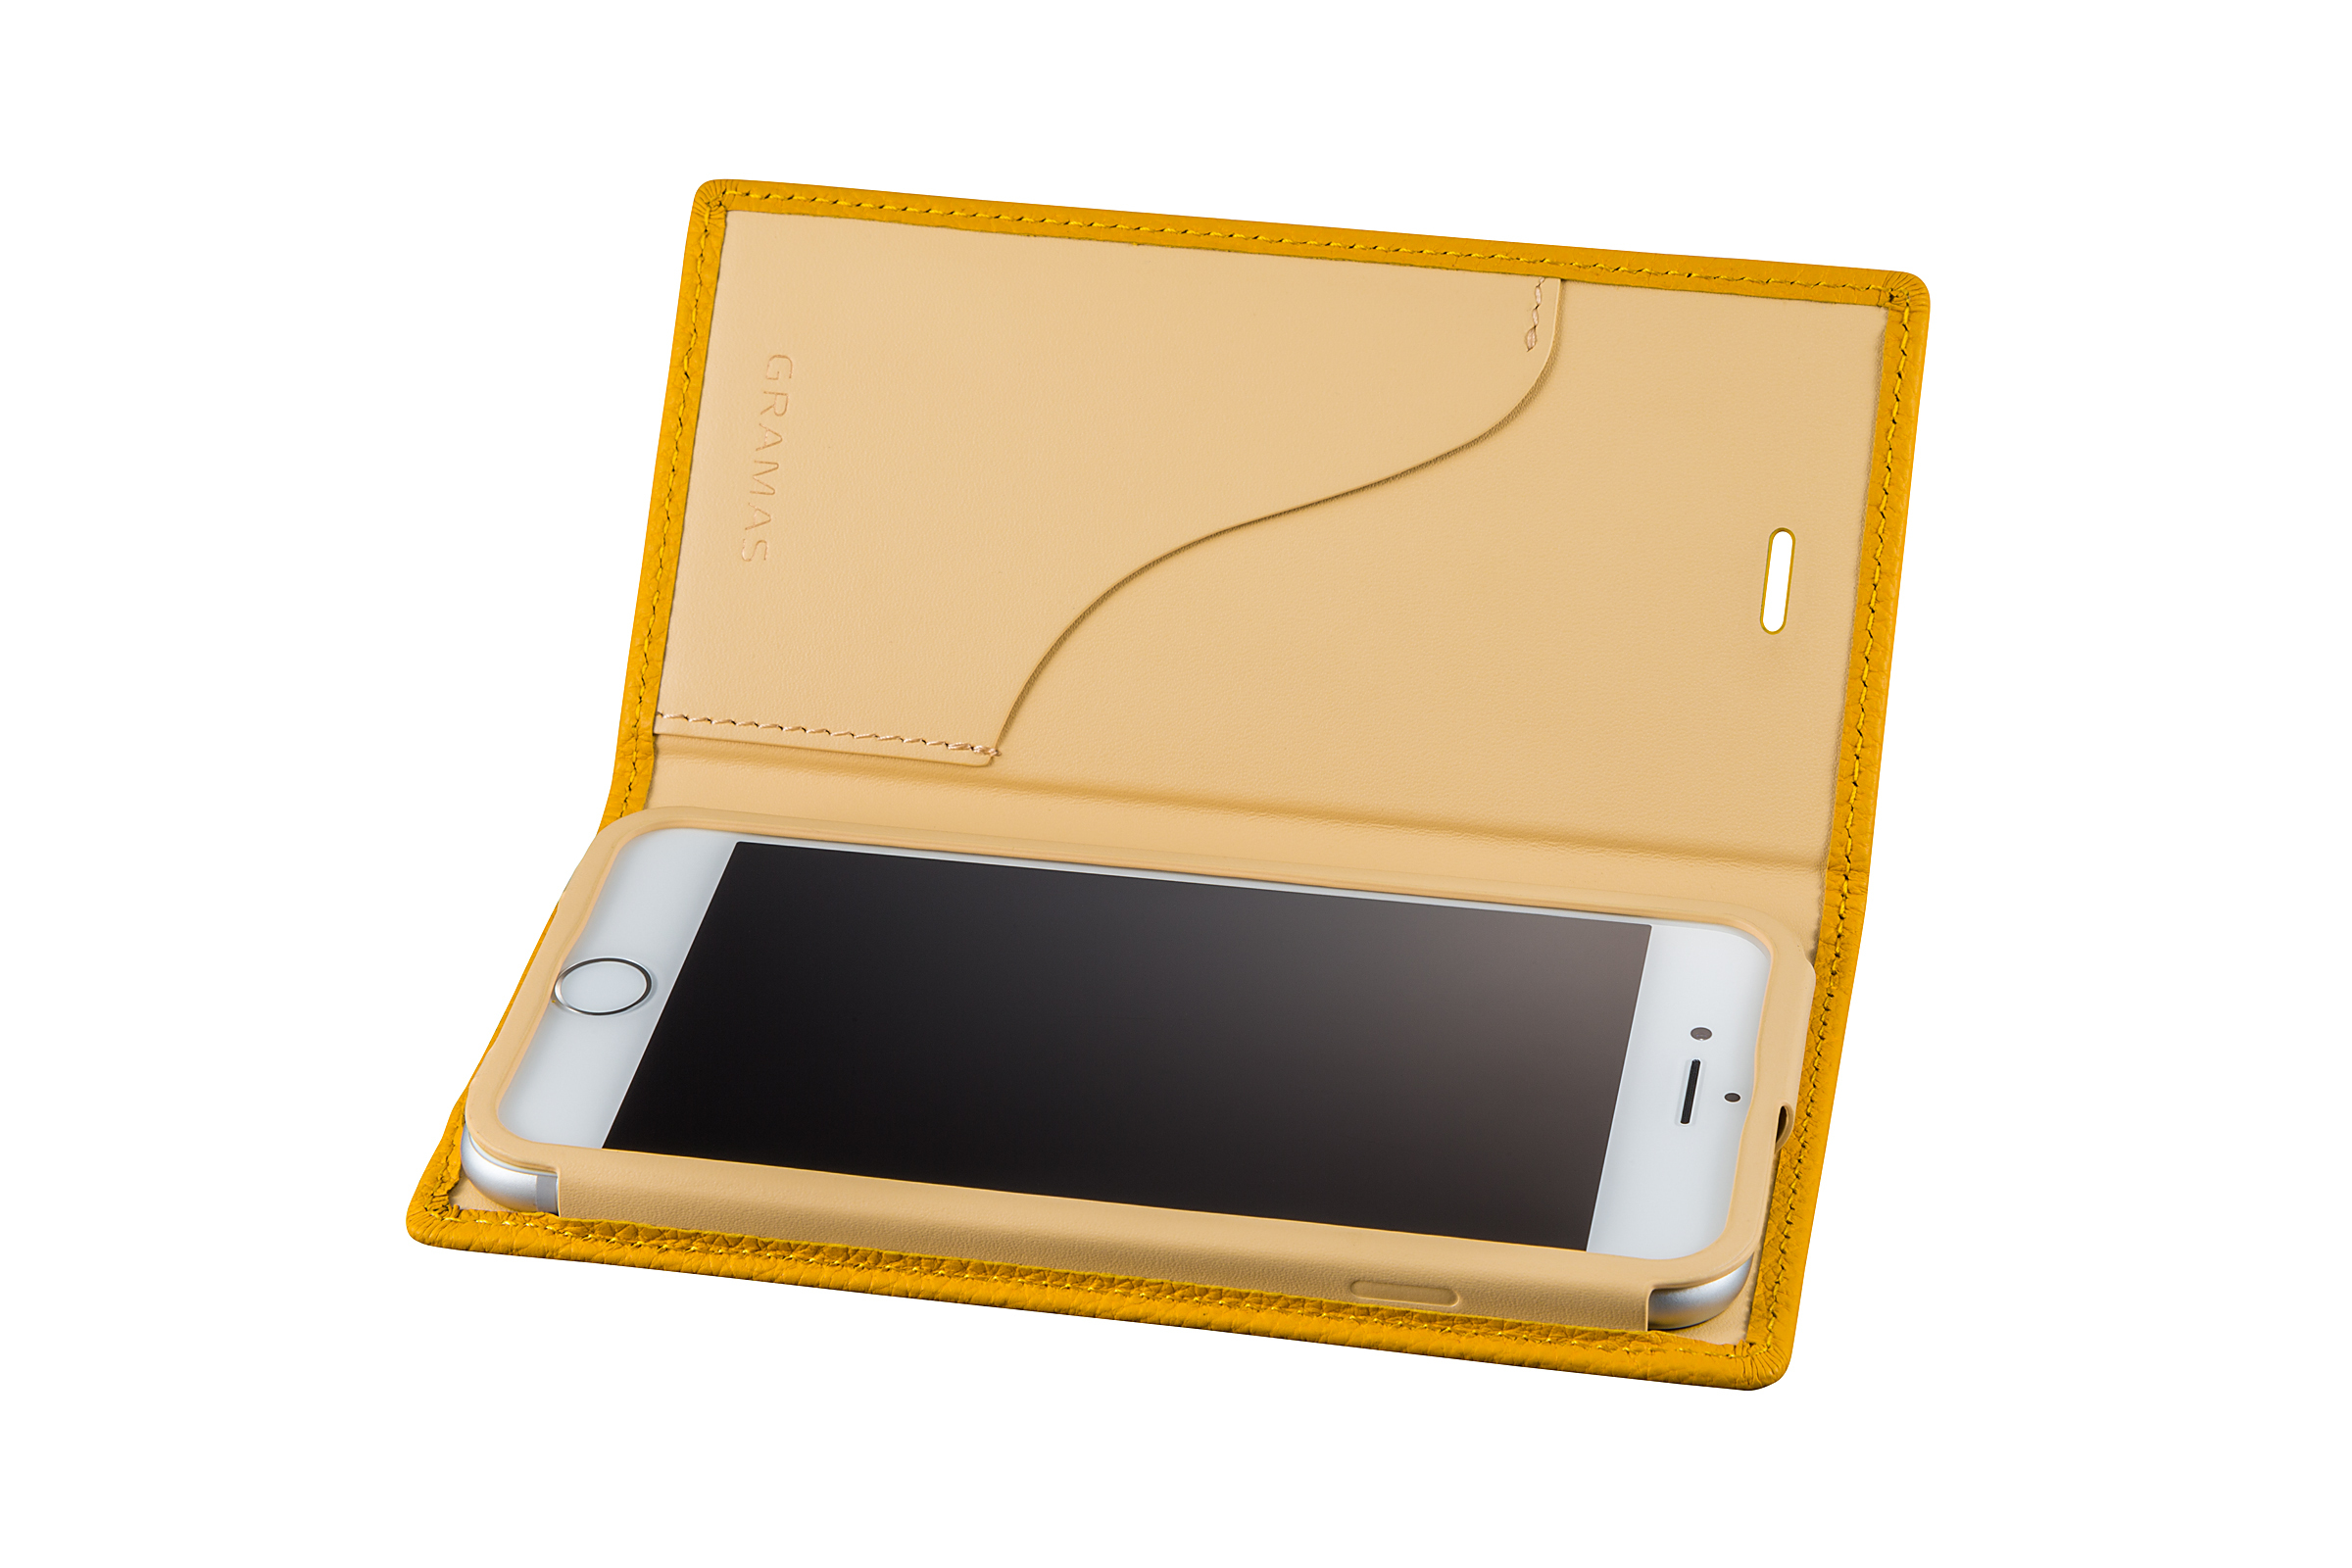 GRAMAS Shrunken-calf Full Leather Case for iPhone 7(Yellow) シュランケンカーフ 手帳型フルレザーケース - 画像3